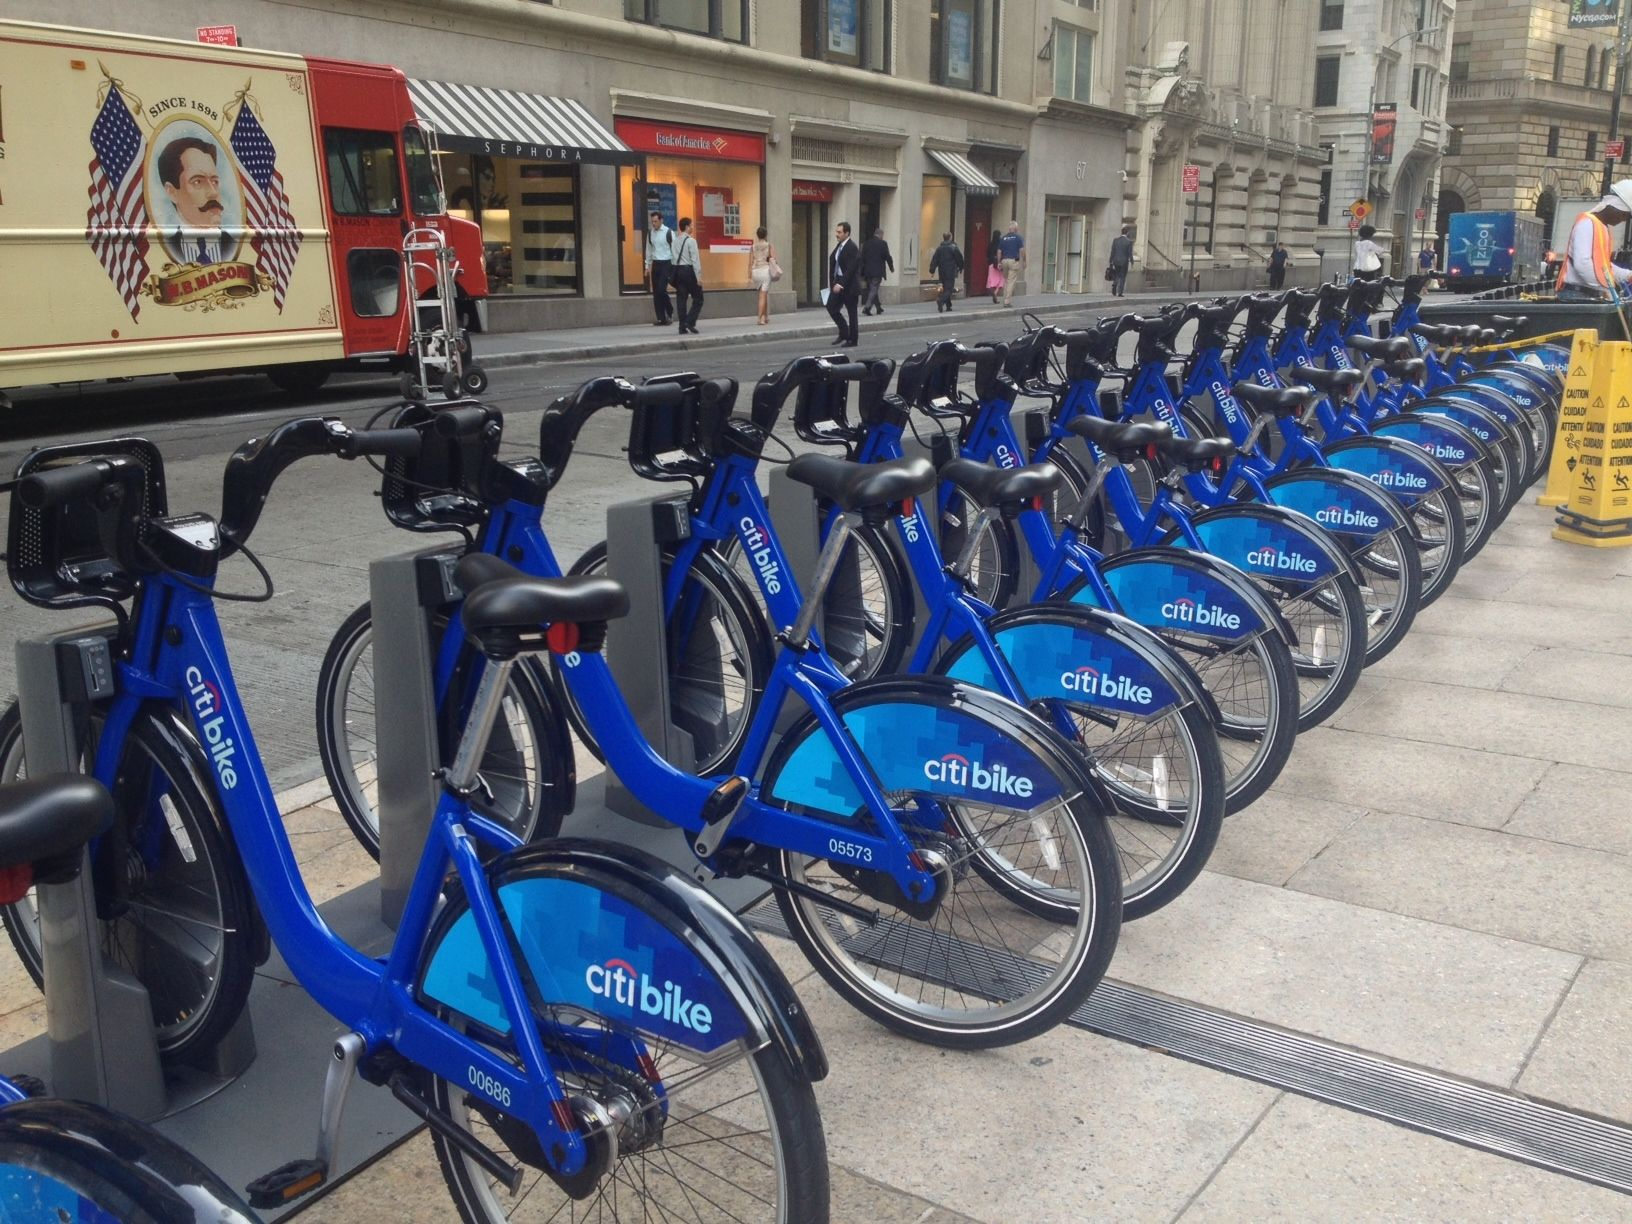 New York City Has Hopped On The Bike Share Bandwagon With Useful